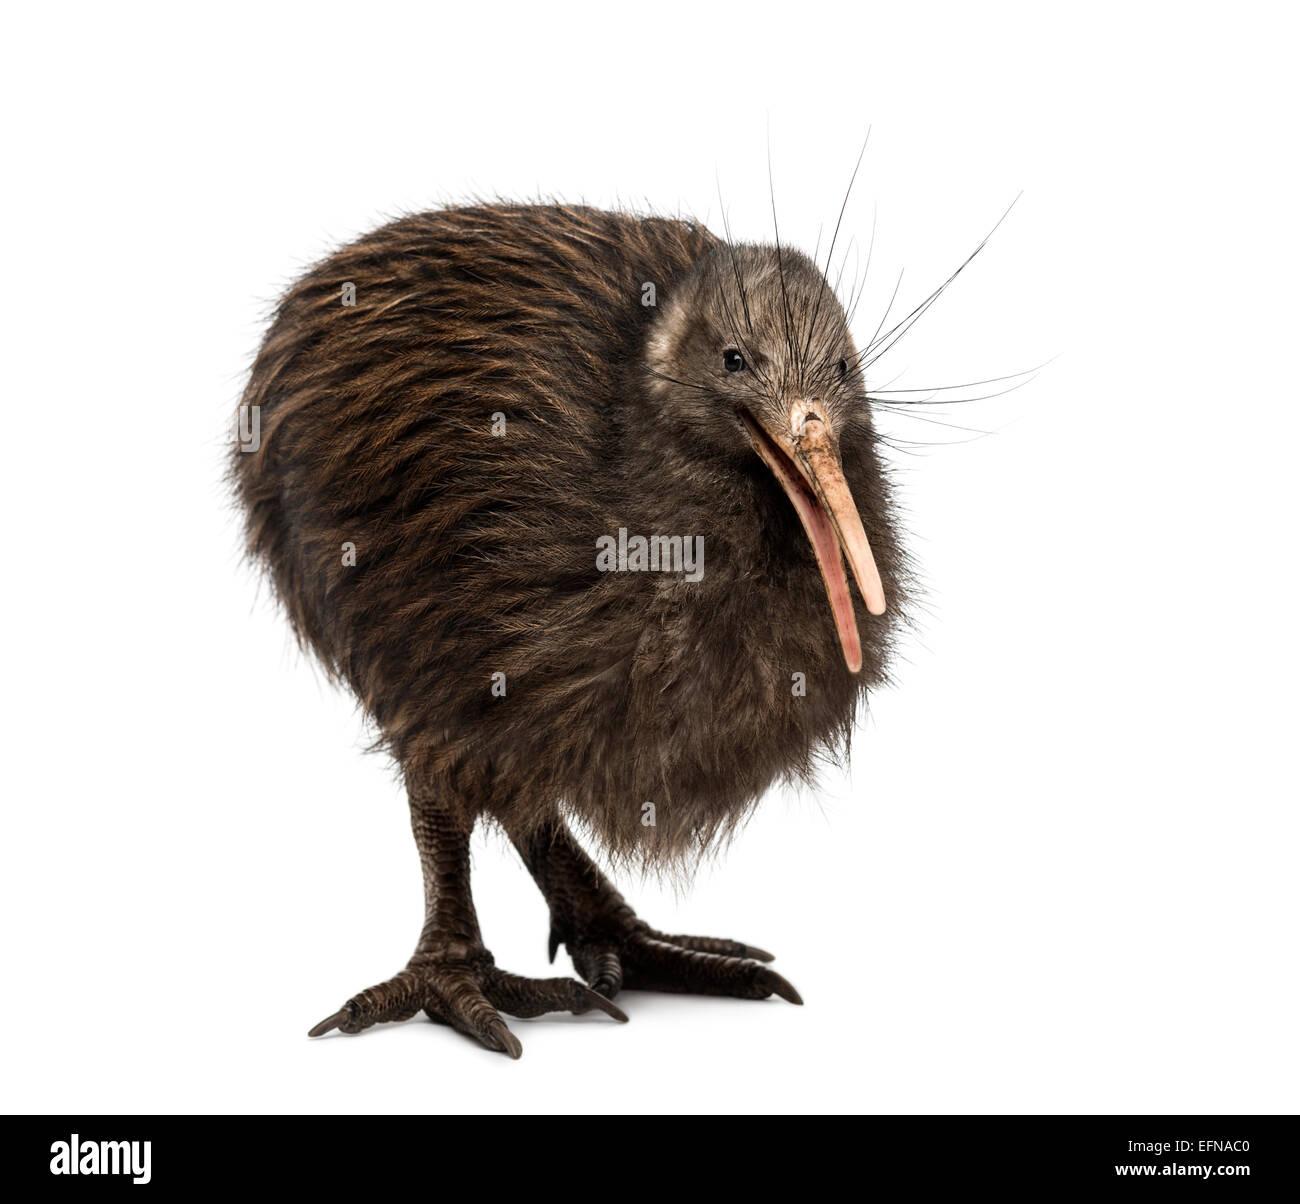 North Island Brown Kiwi, Apteryx mantelli, against white background - Stock Image